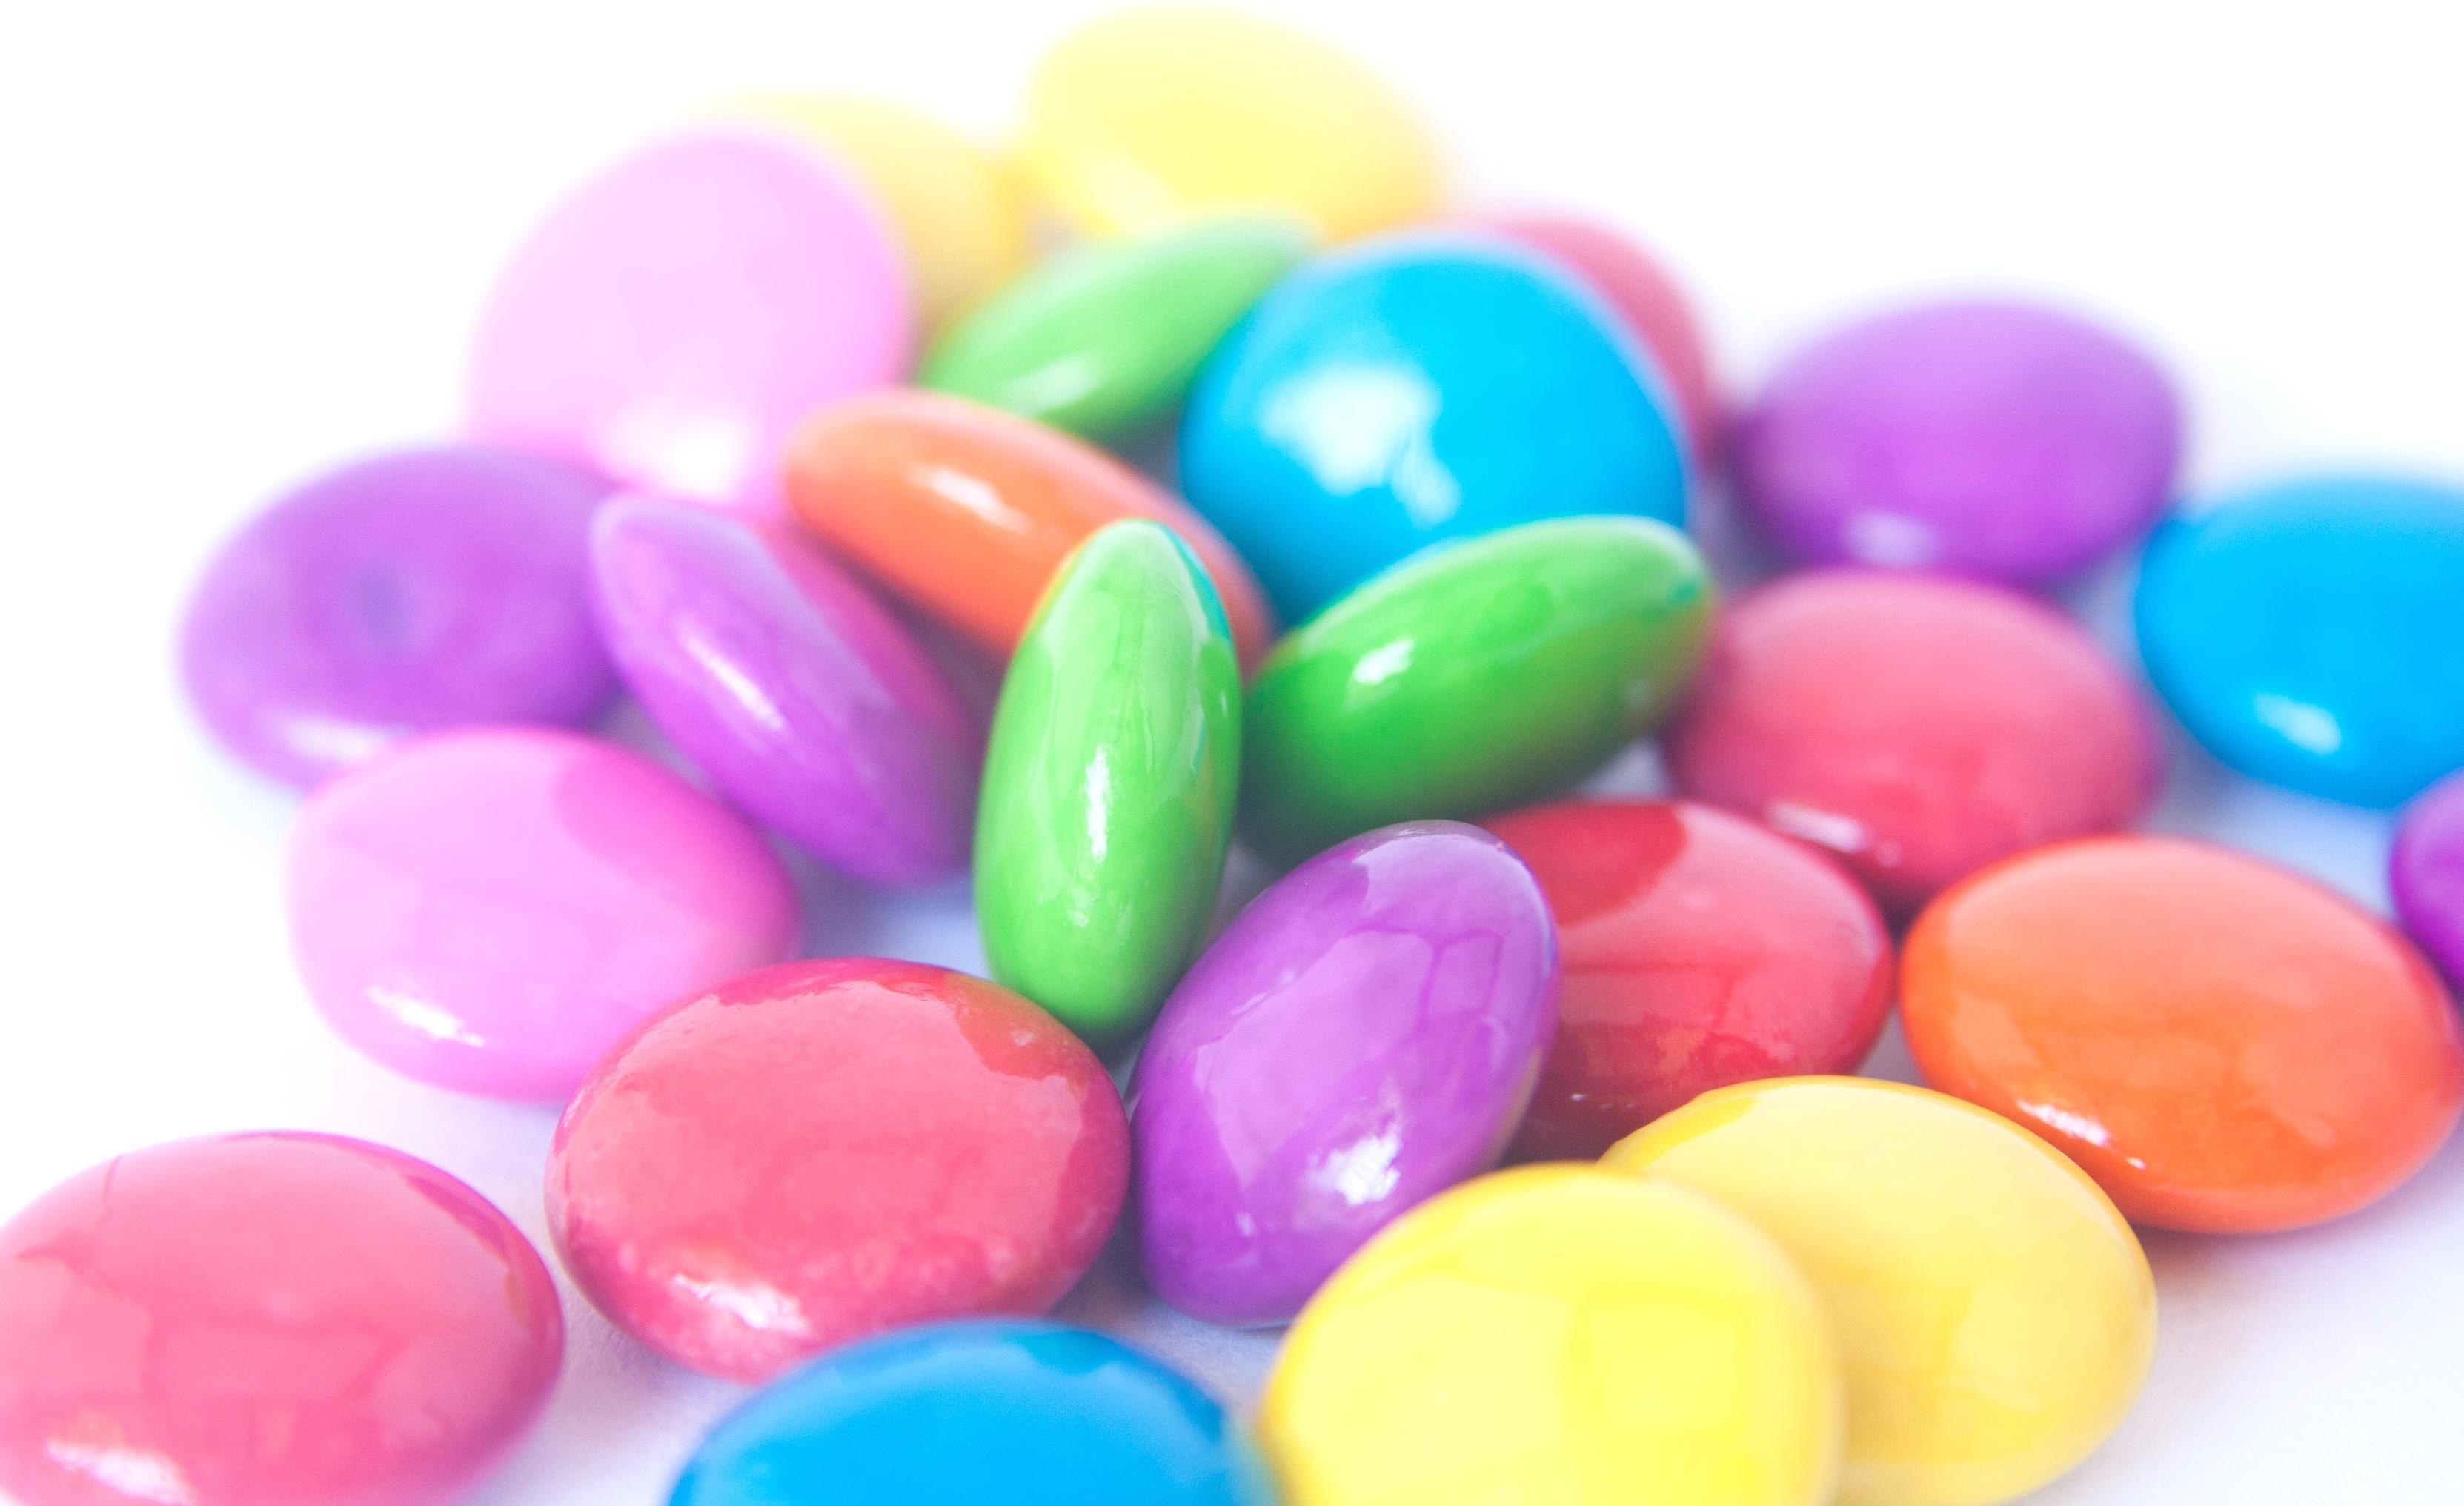 Ucretsiz Resim Cikolata Renkleri Seker Tatli Pastel Boya